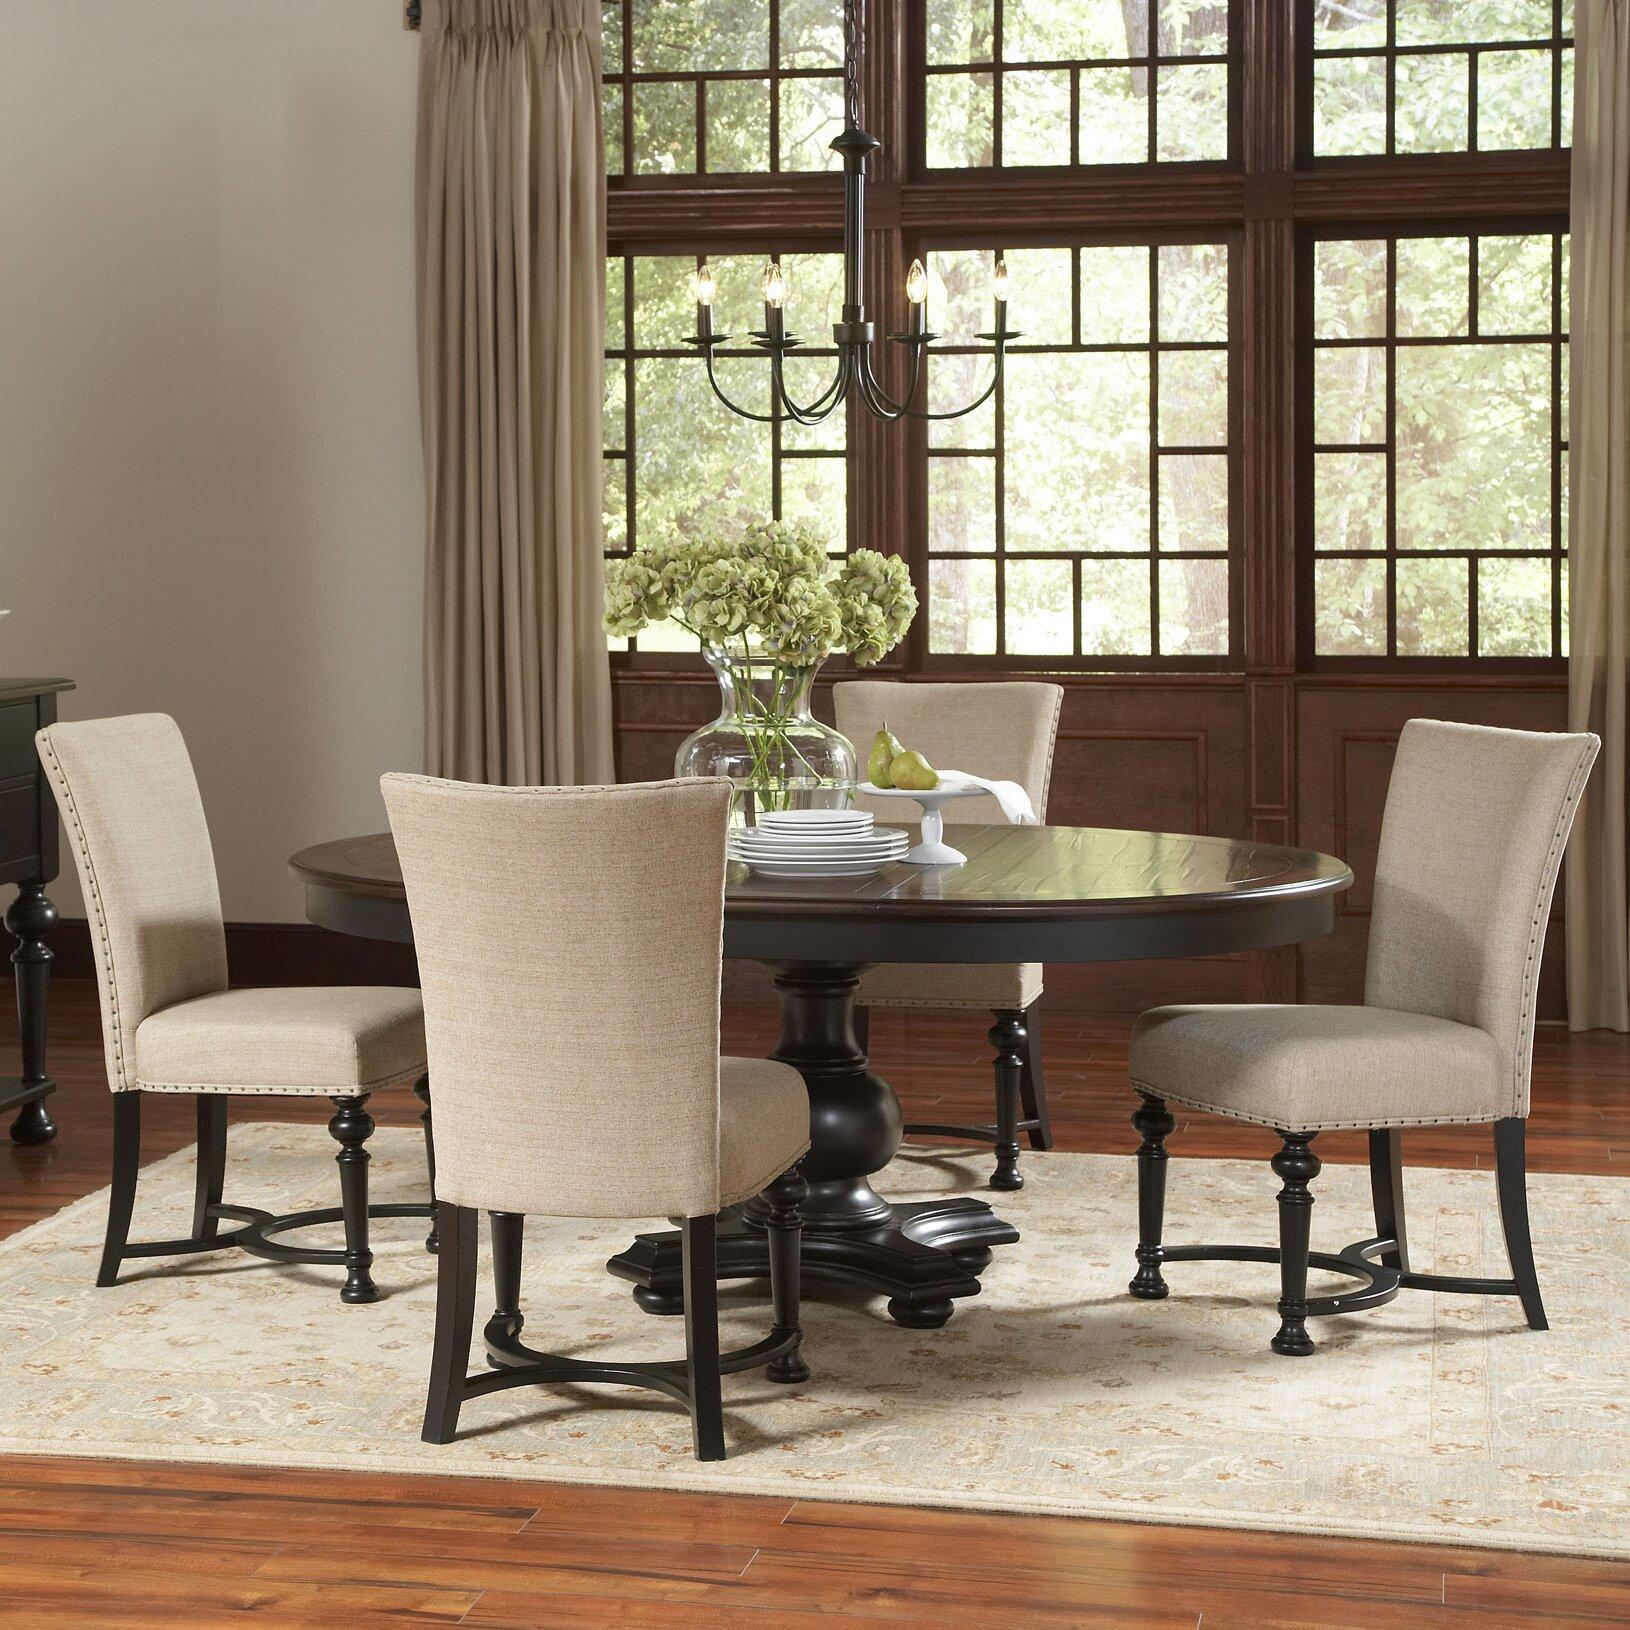 riverside furniture williamsport 5 piece dining set